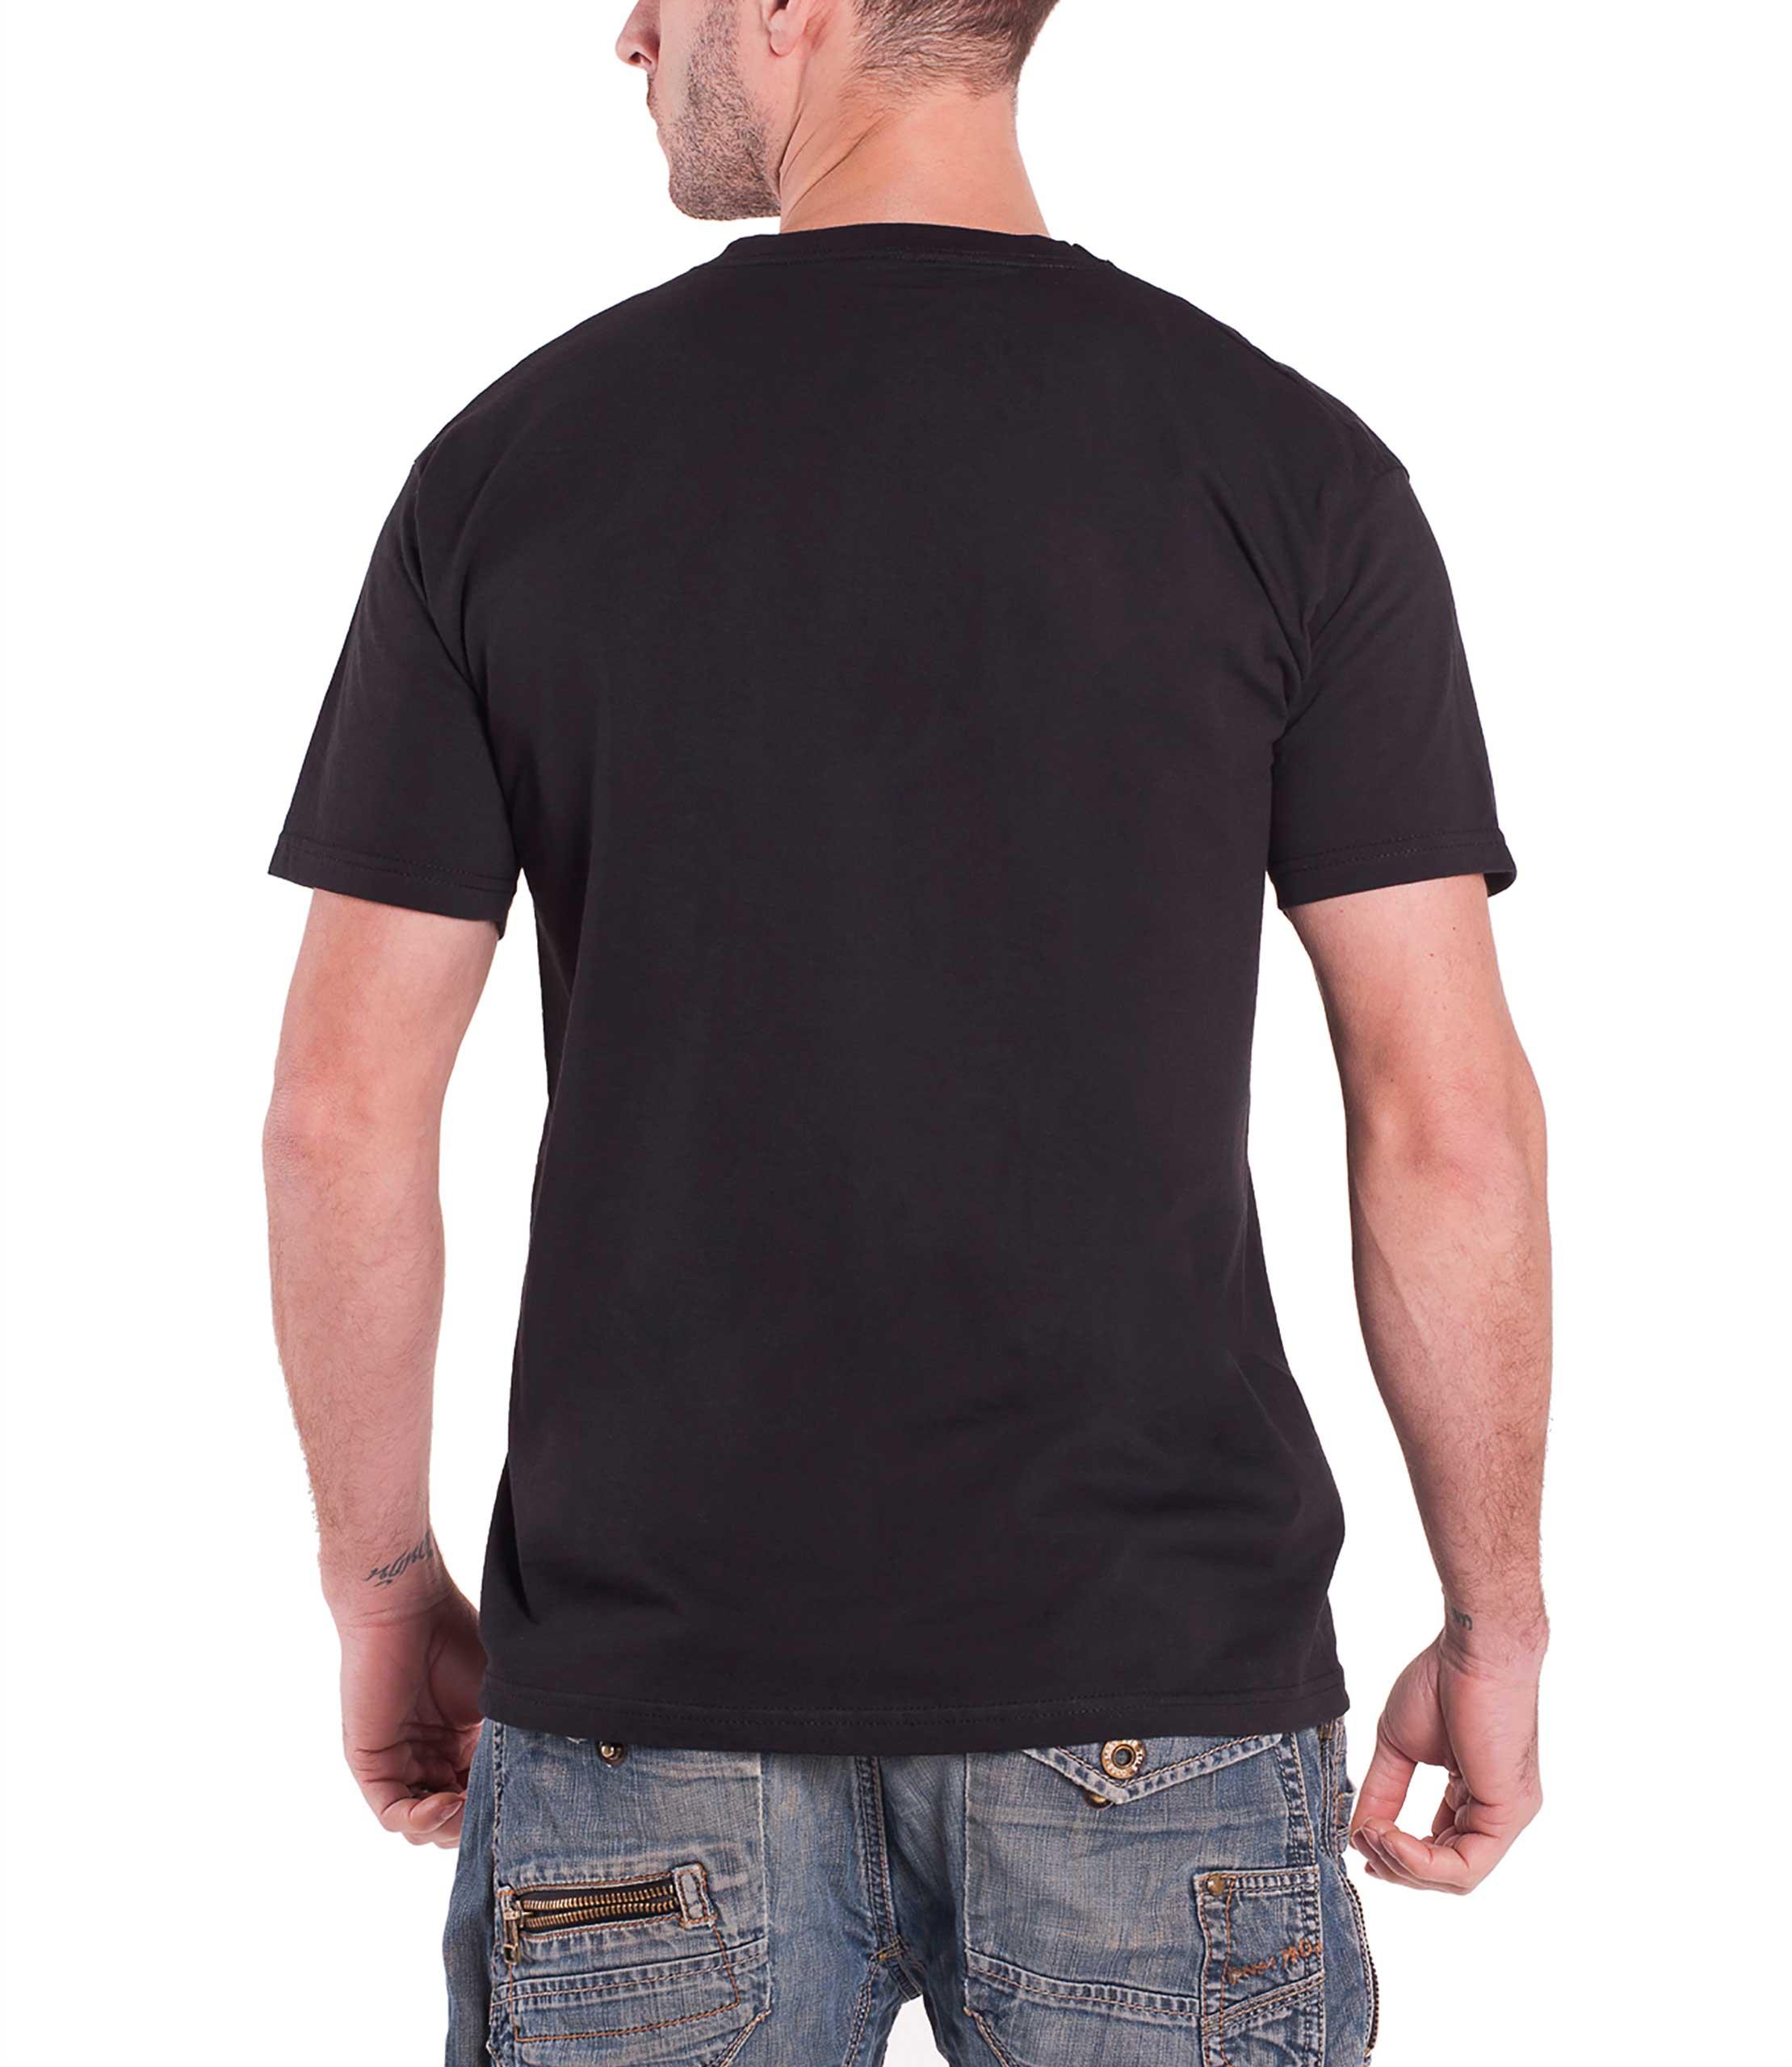 ab76db117b21 Kiss T Shirt Gene Simmons Destroyer Love Gun band logo new Official ...